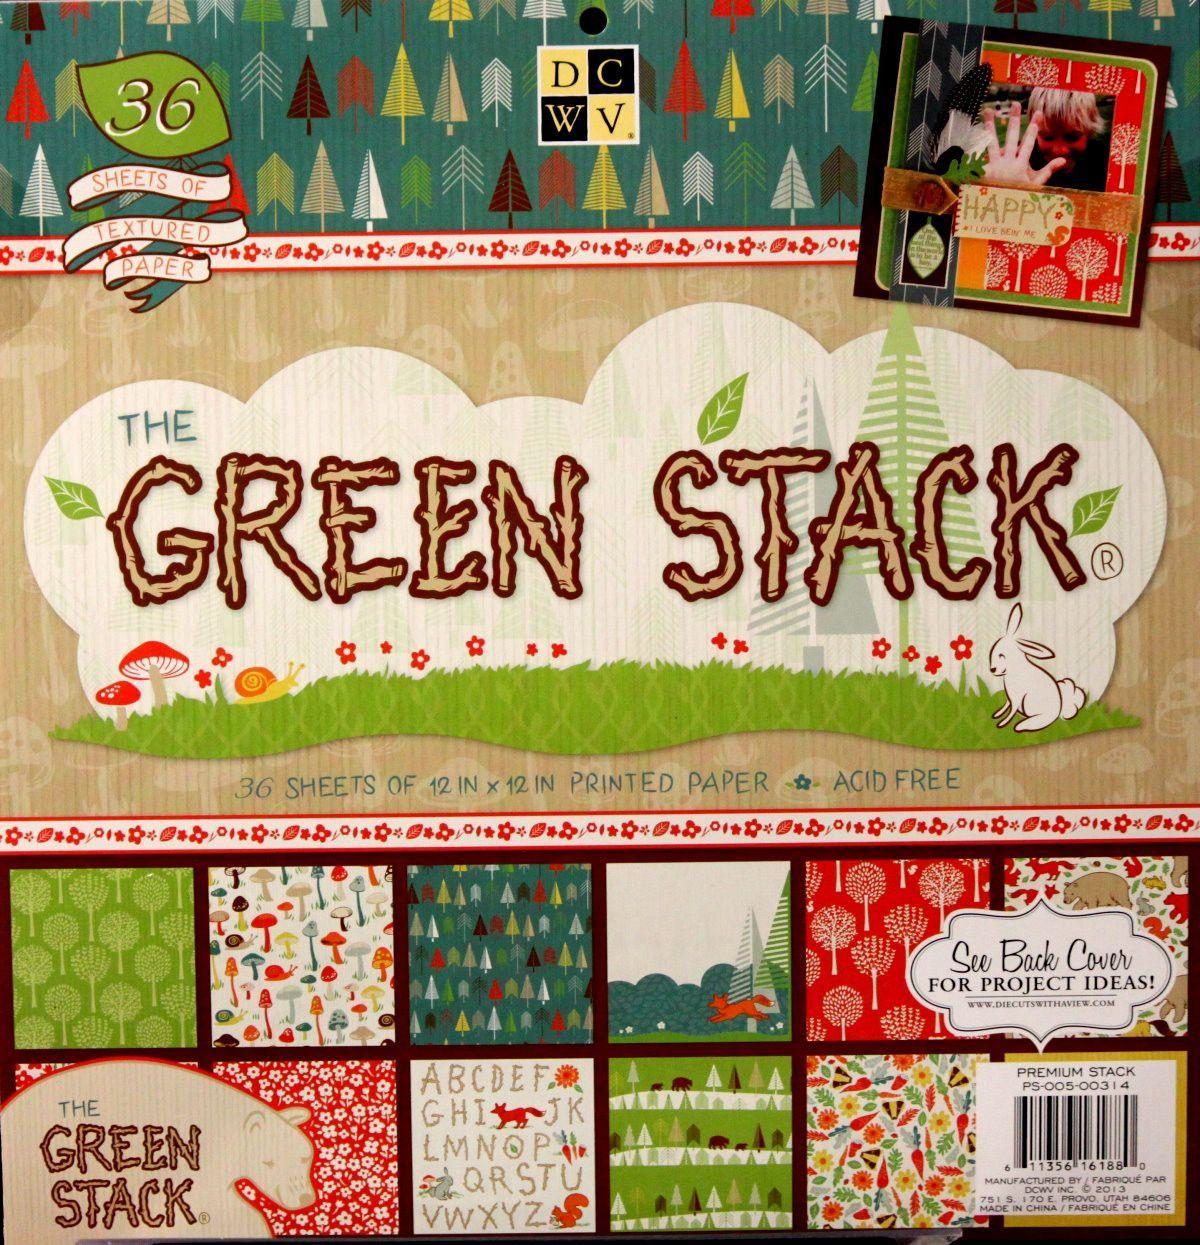 Scrapbook paper cardstock - Dcwv 12 X 12 The Green Stack Specialty Textured Cardstock Scrapbook Paper Pad